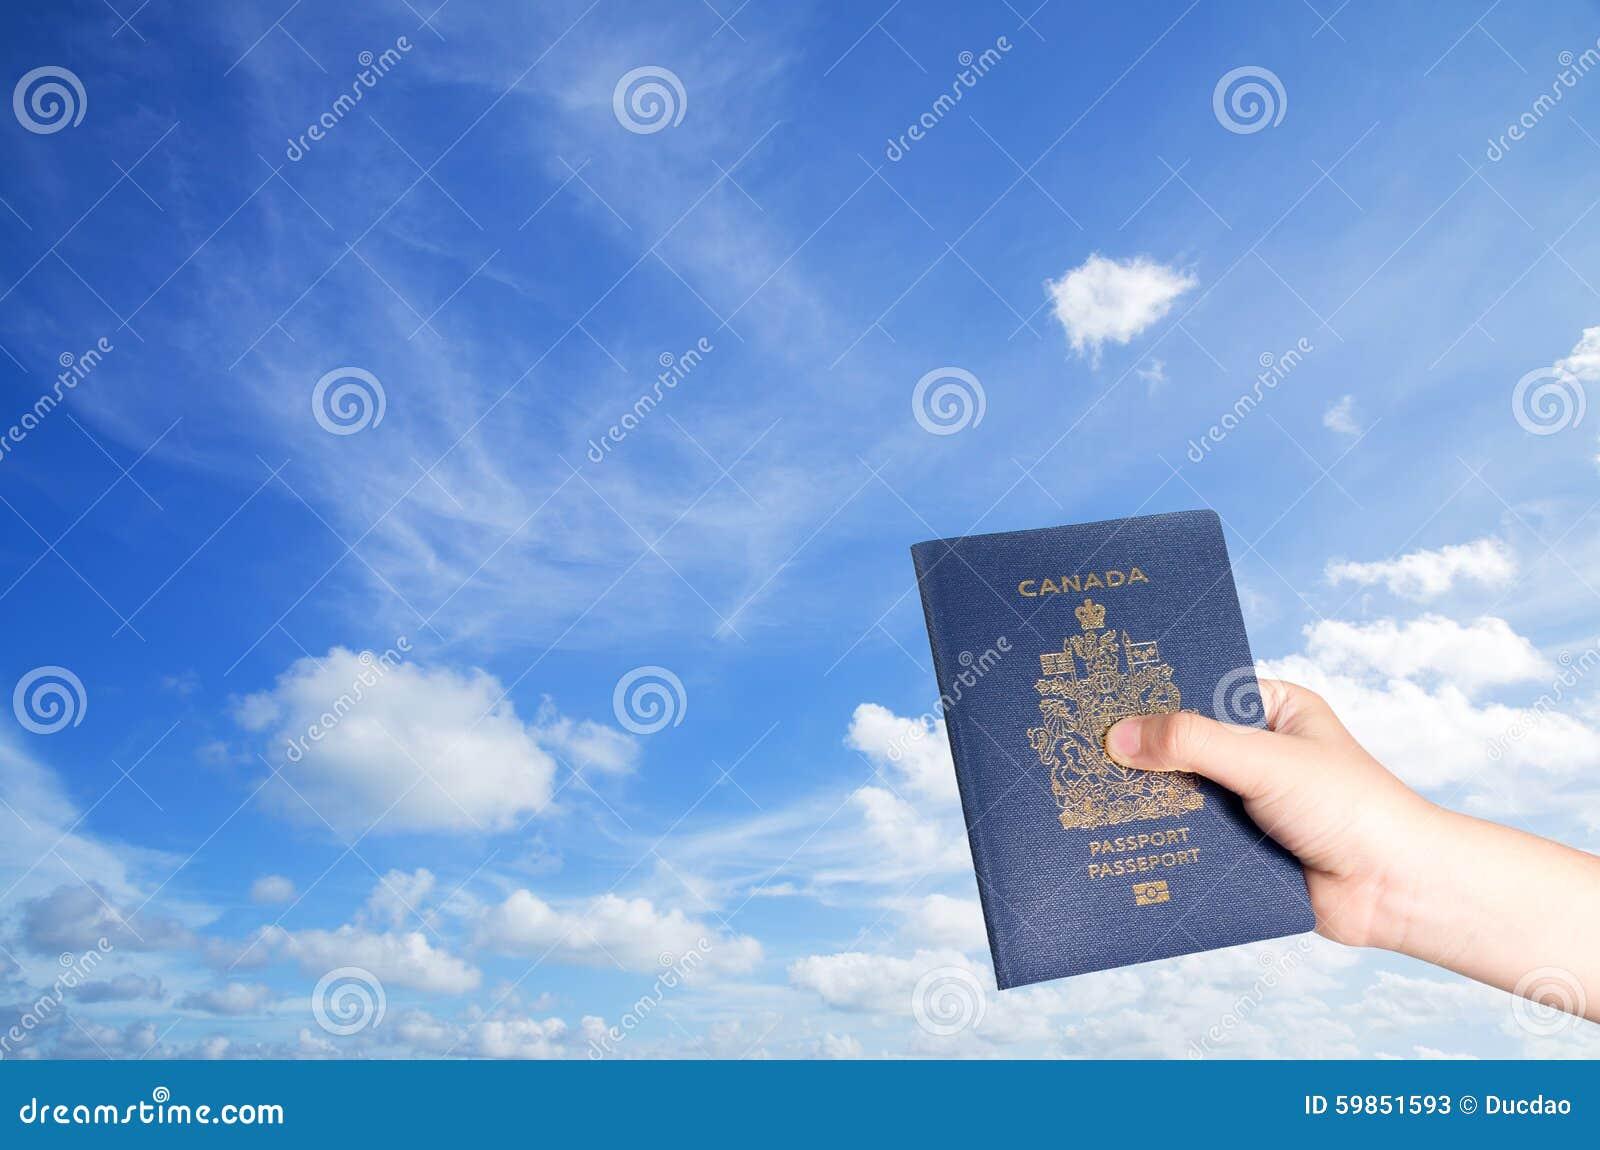 canadian italian passport application child